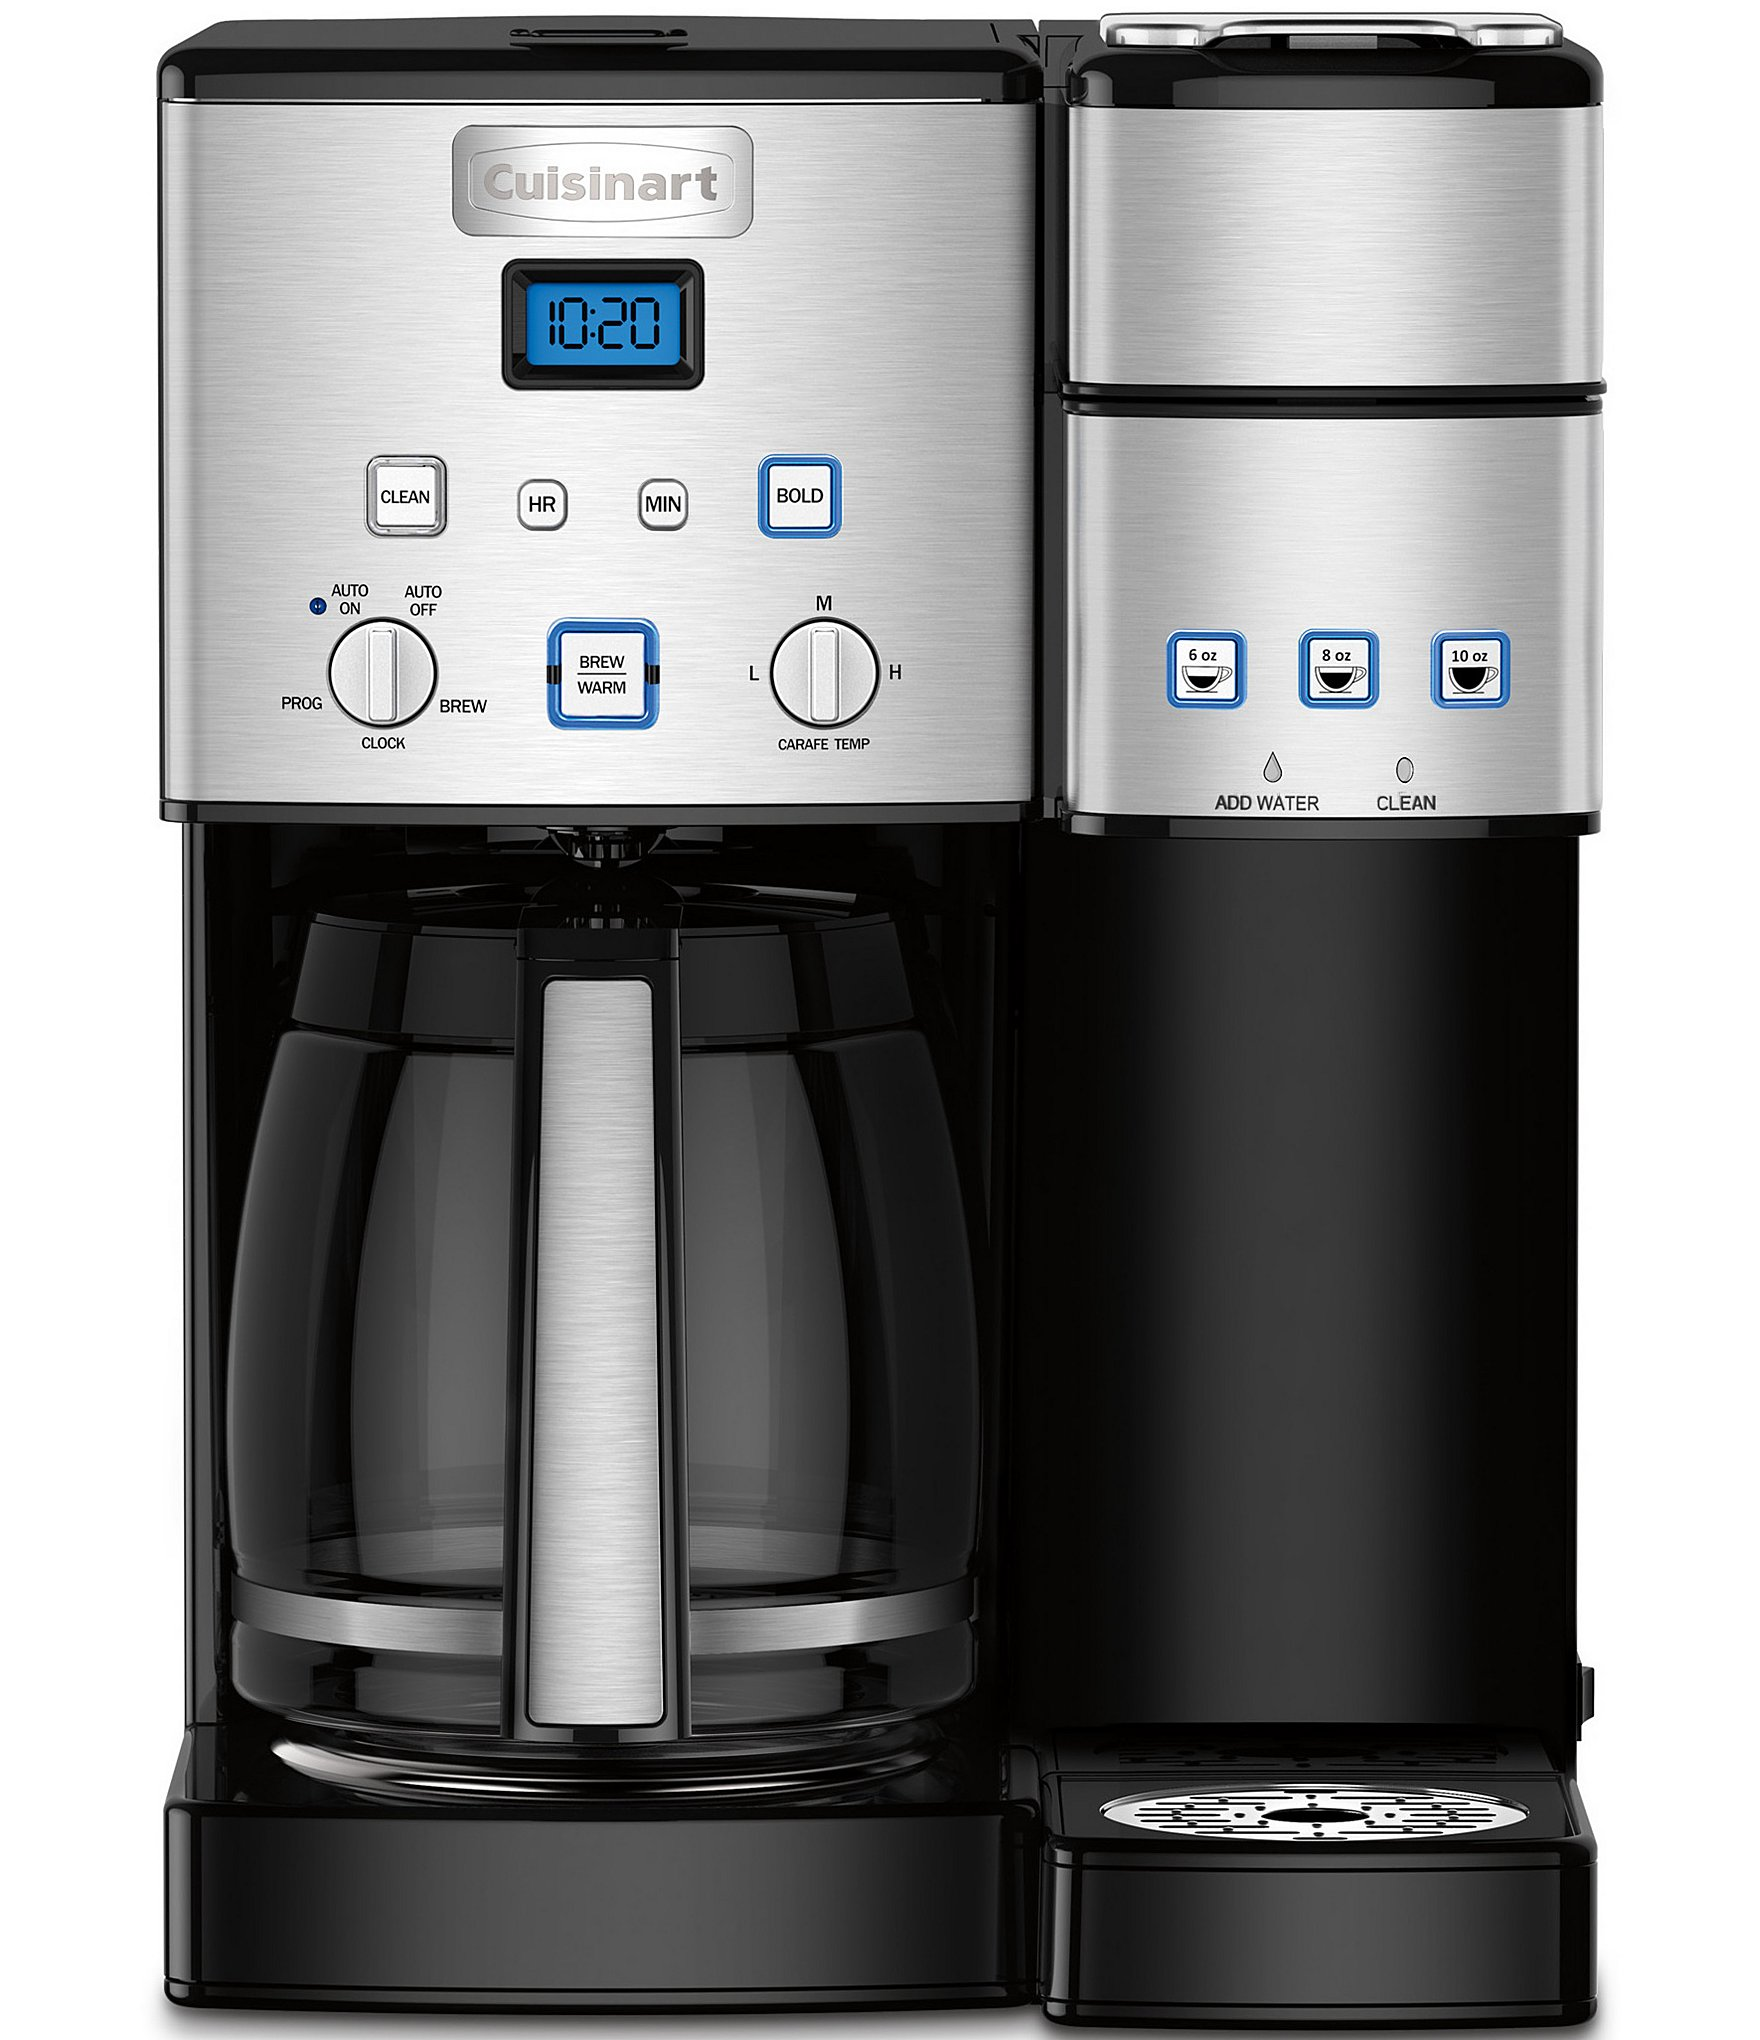 7eaefc68bdf Cuisinart Coffee Center 12+-Cup Coffee Maker   Single-Serve Brewer ...